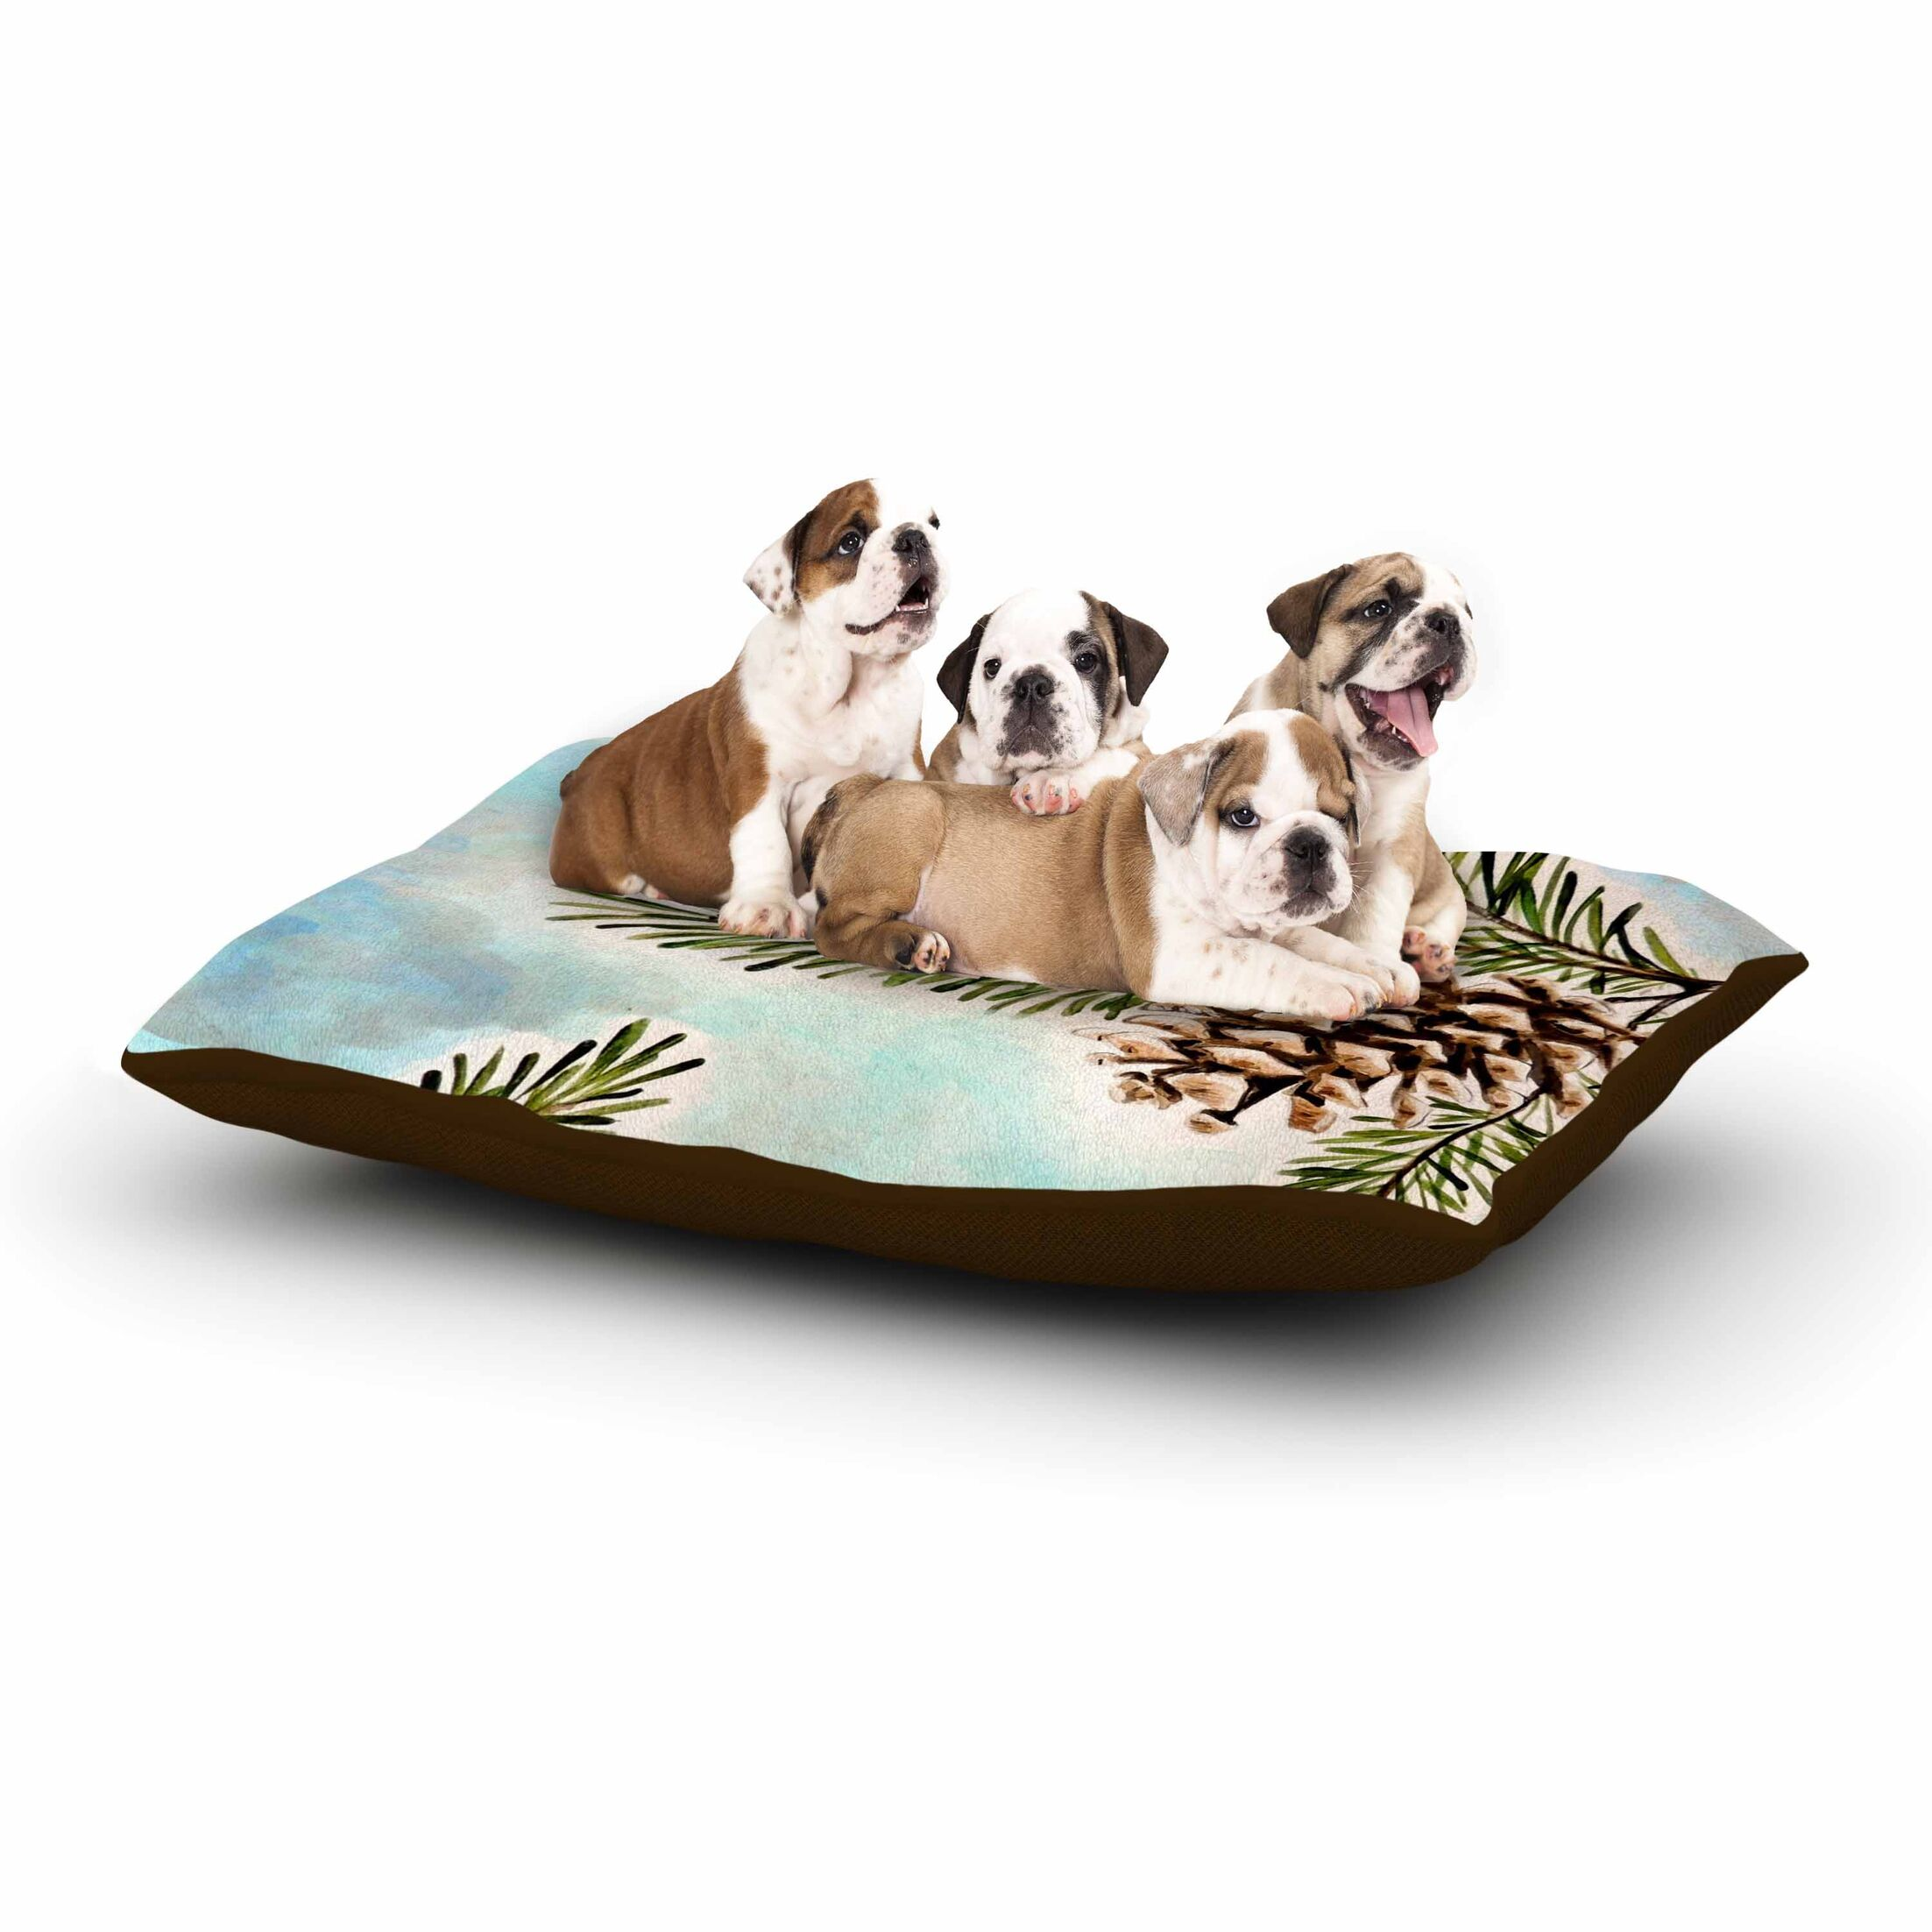 Christen Treat 'Pinecones and Sky' Dog Pillow with Fleece Cozy Top